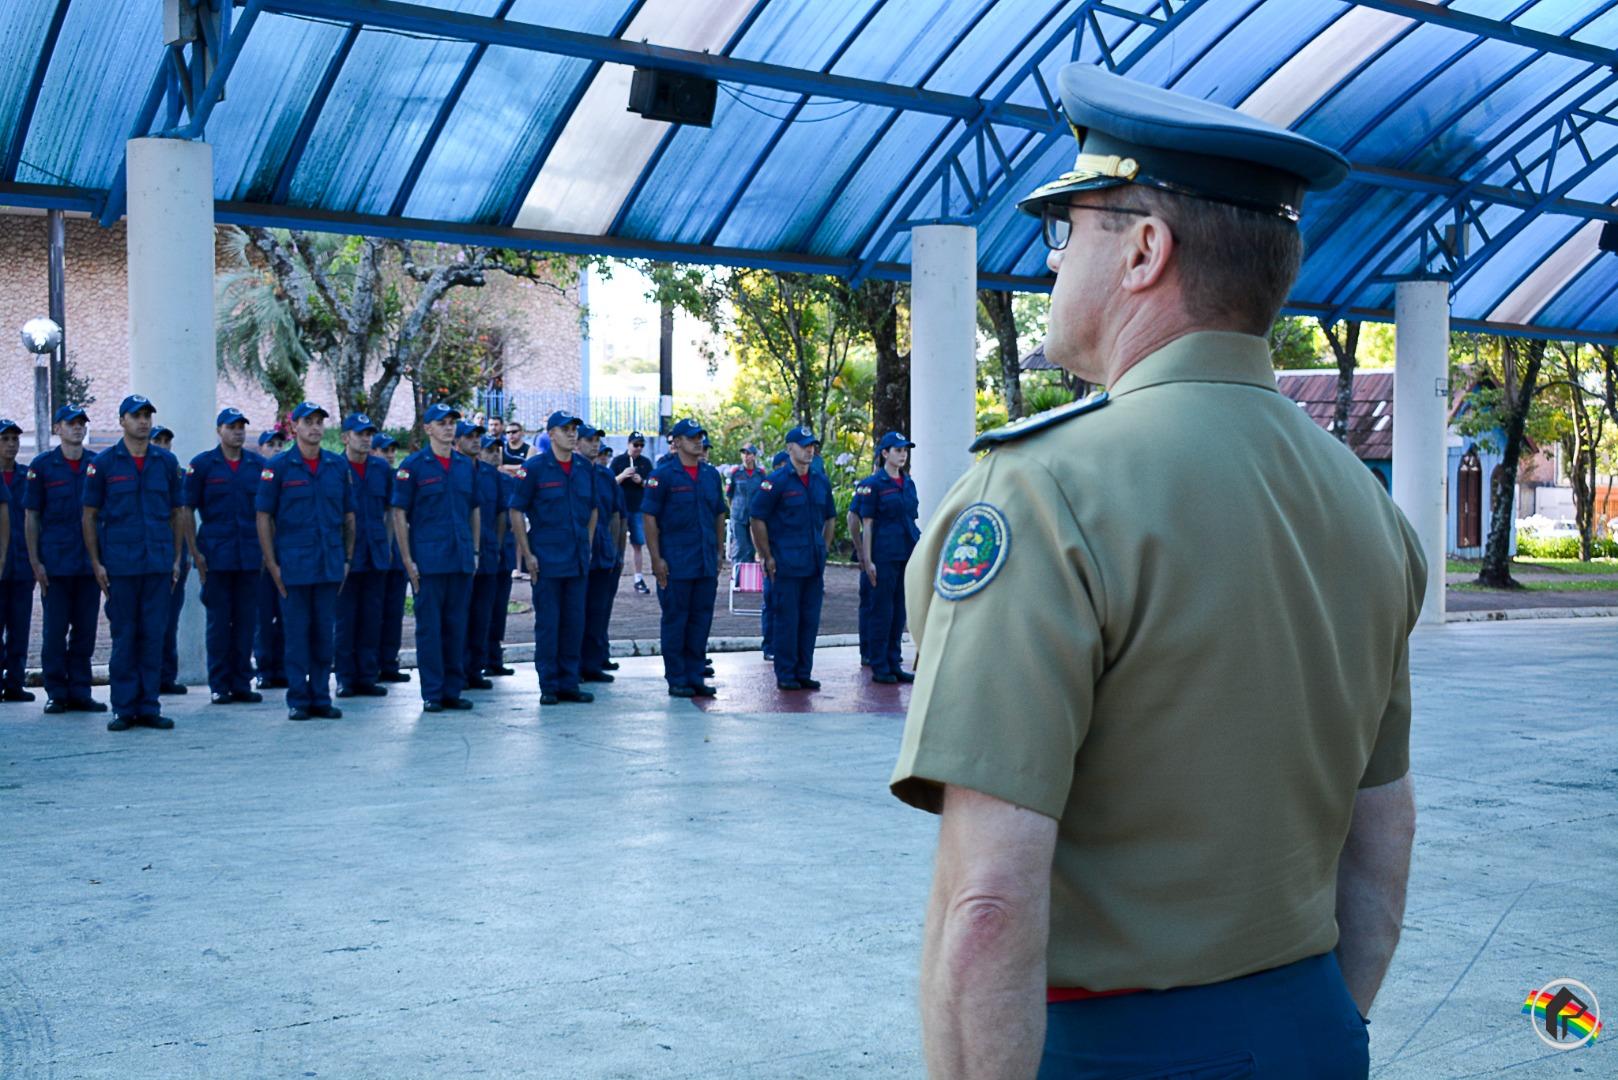 VÍDEO: Solenidade marca formatura de 32 novos soldados Bombeiro Militar